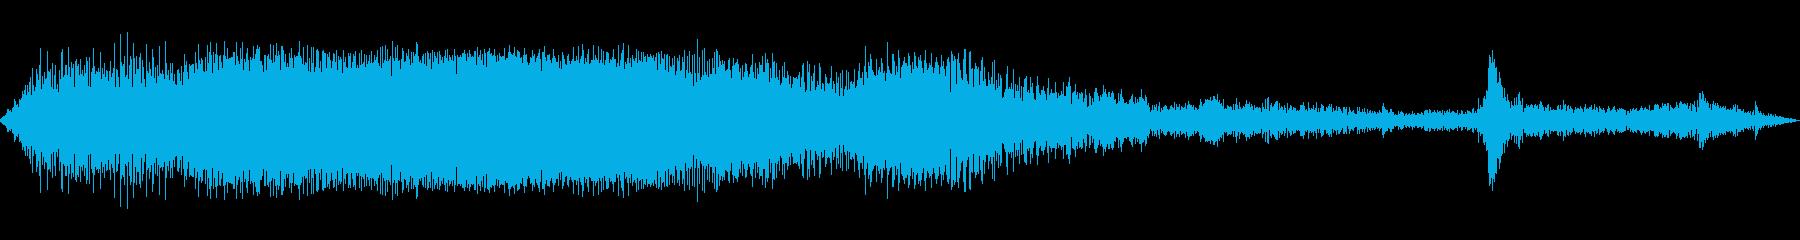 INT:リバース、ストップの再生済みの波形